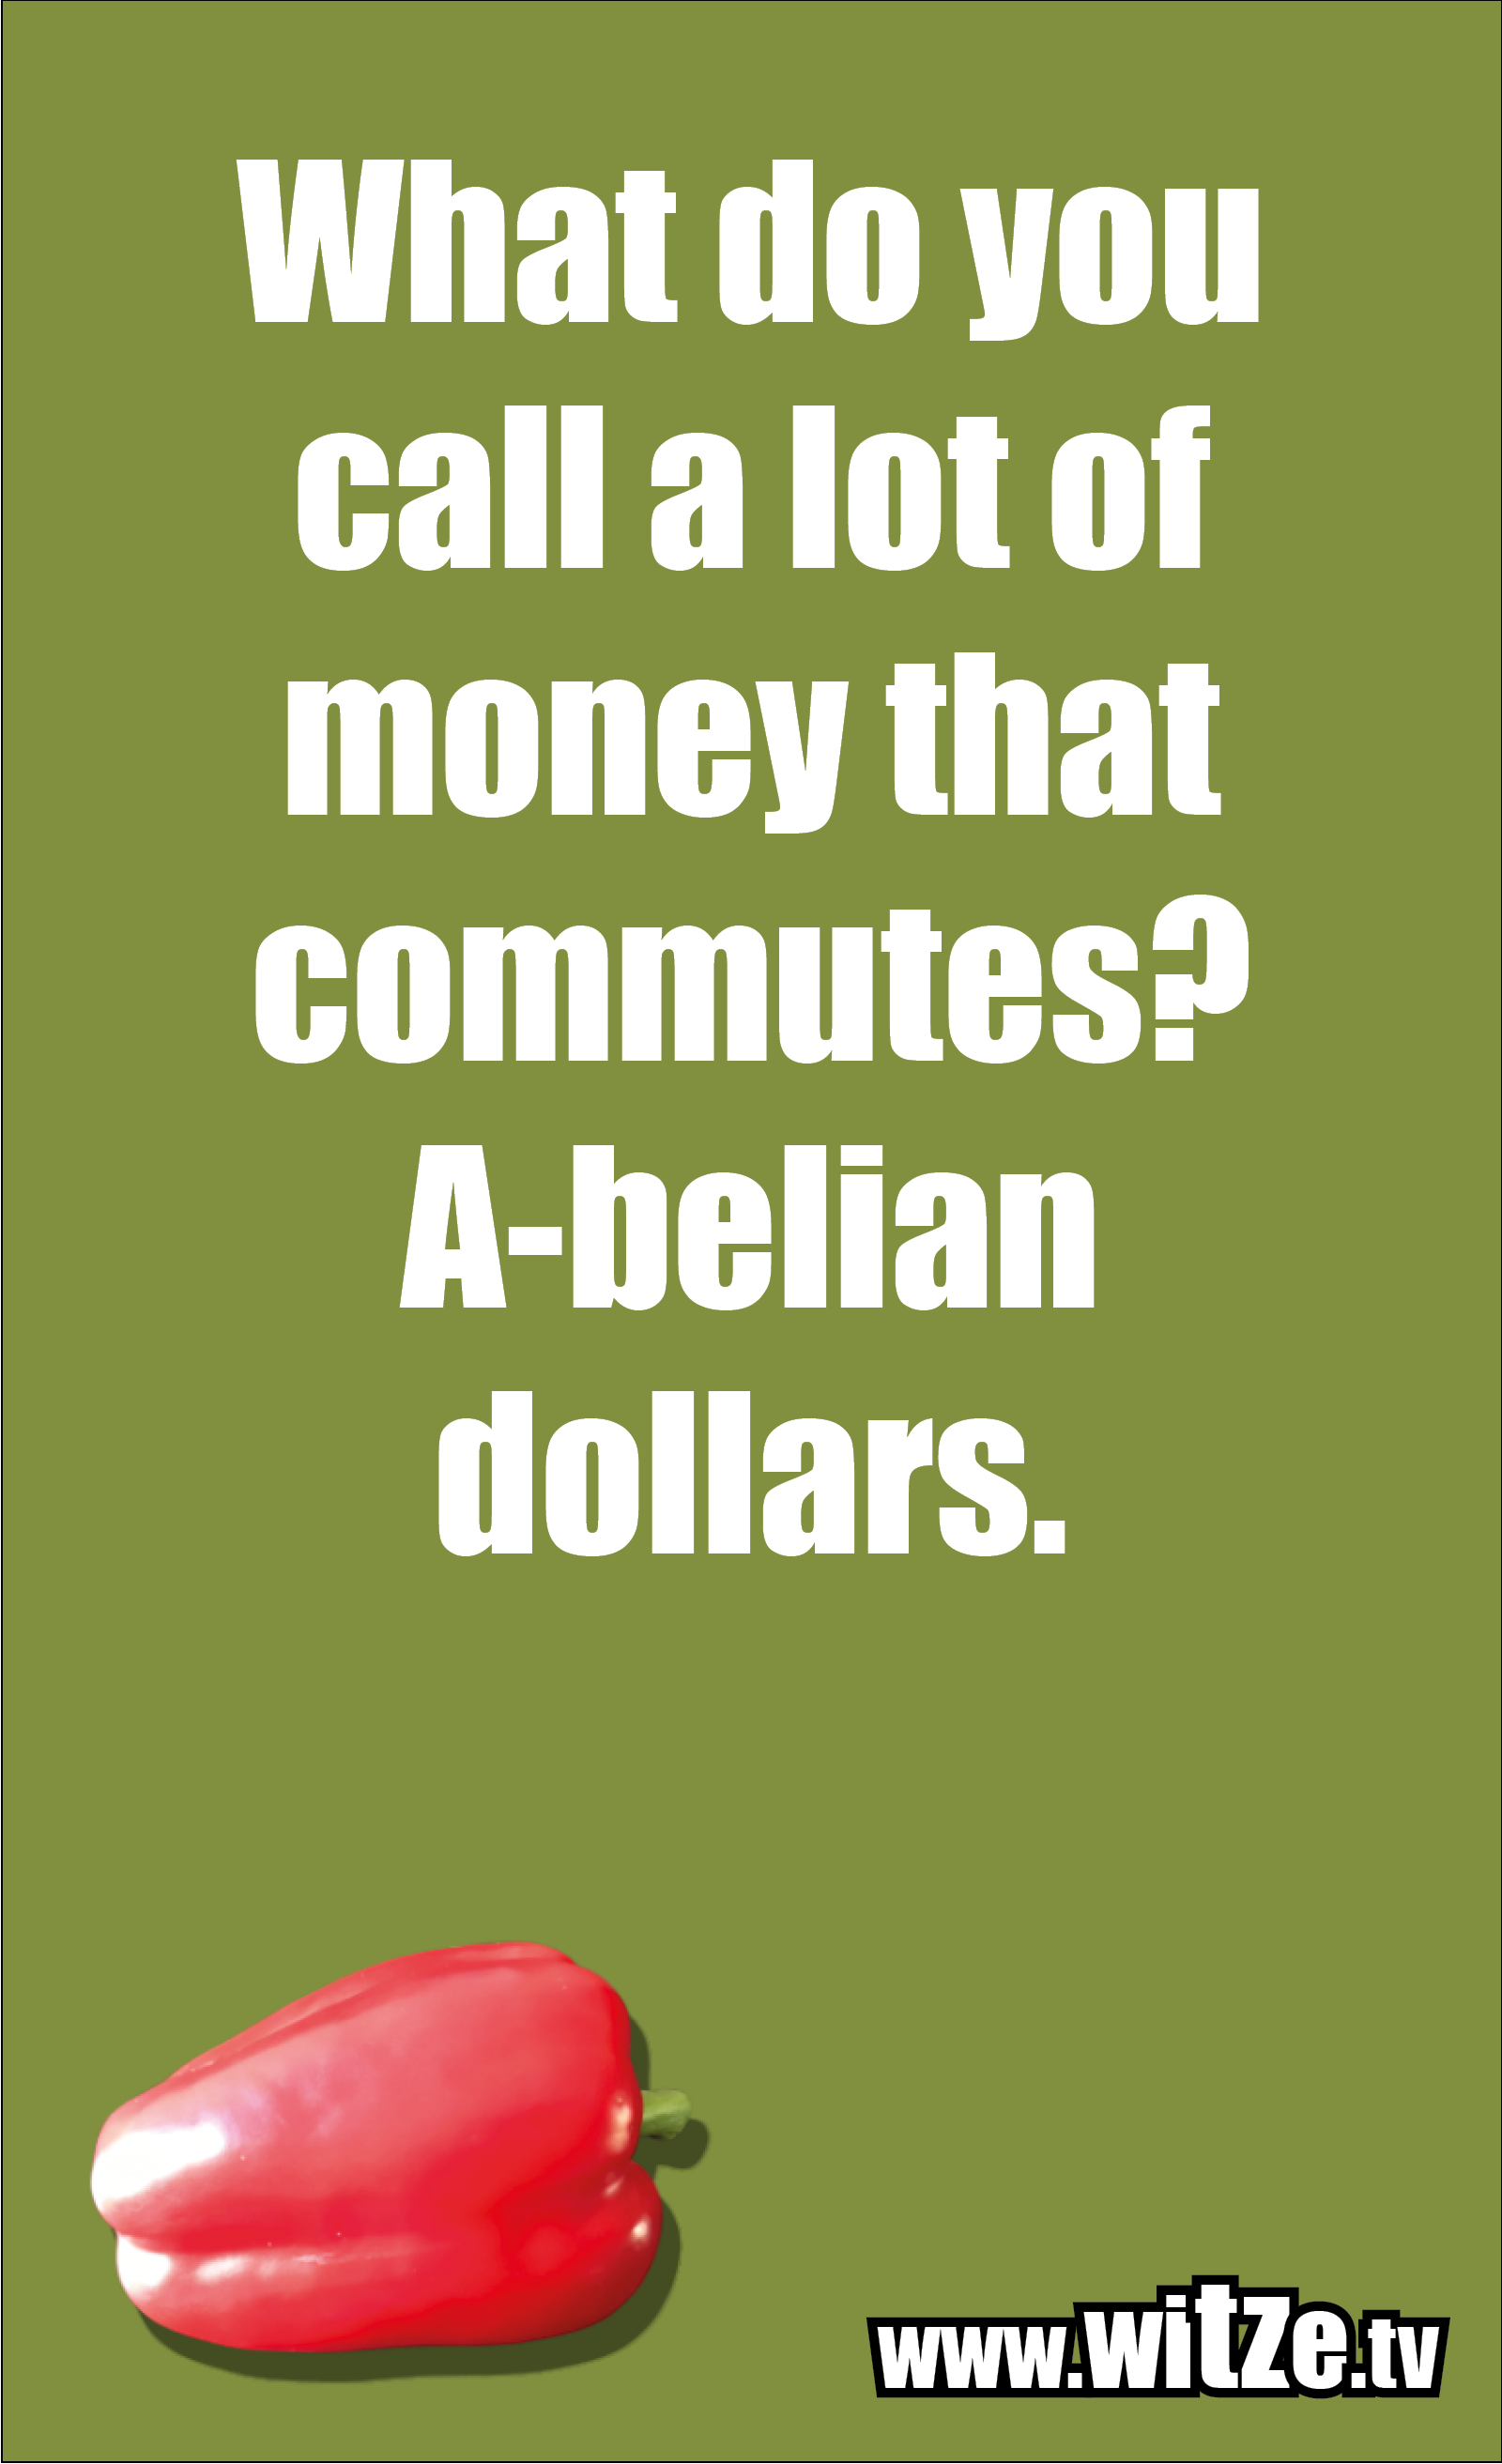 Math joke… What do you call a lot of money that commutes? A-belian dollars.